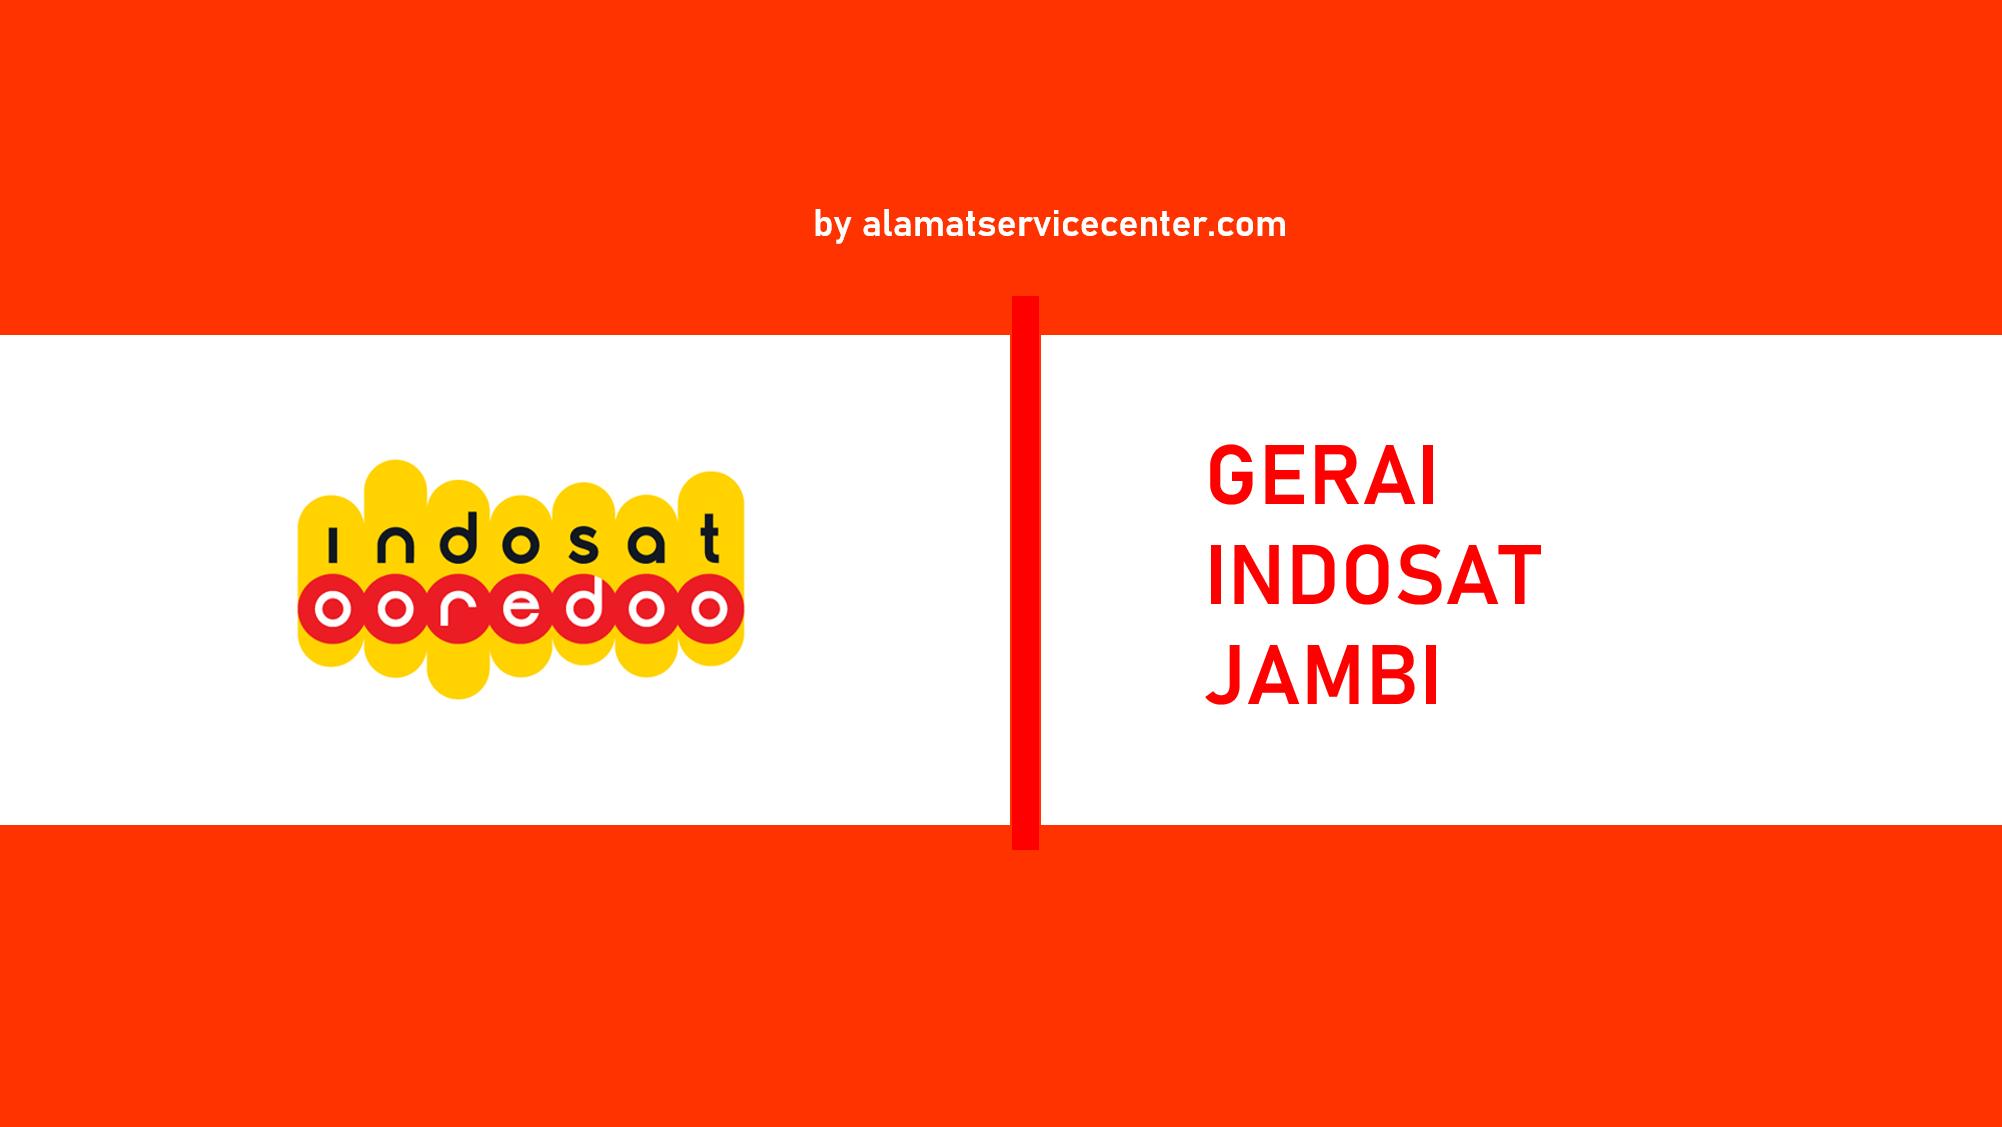 Gerai Indosat Jambi